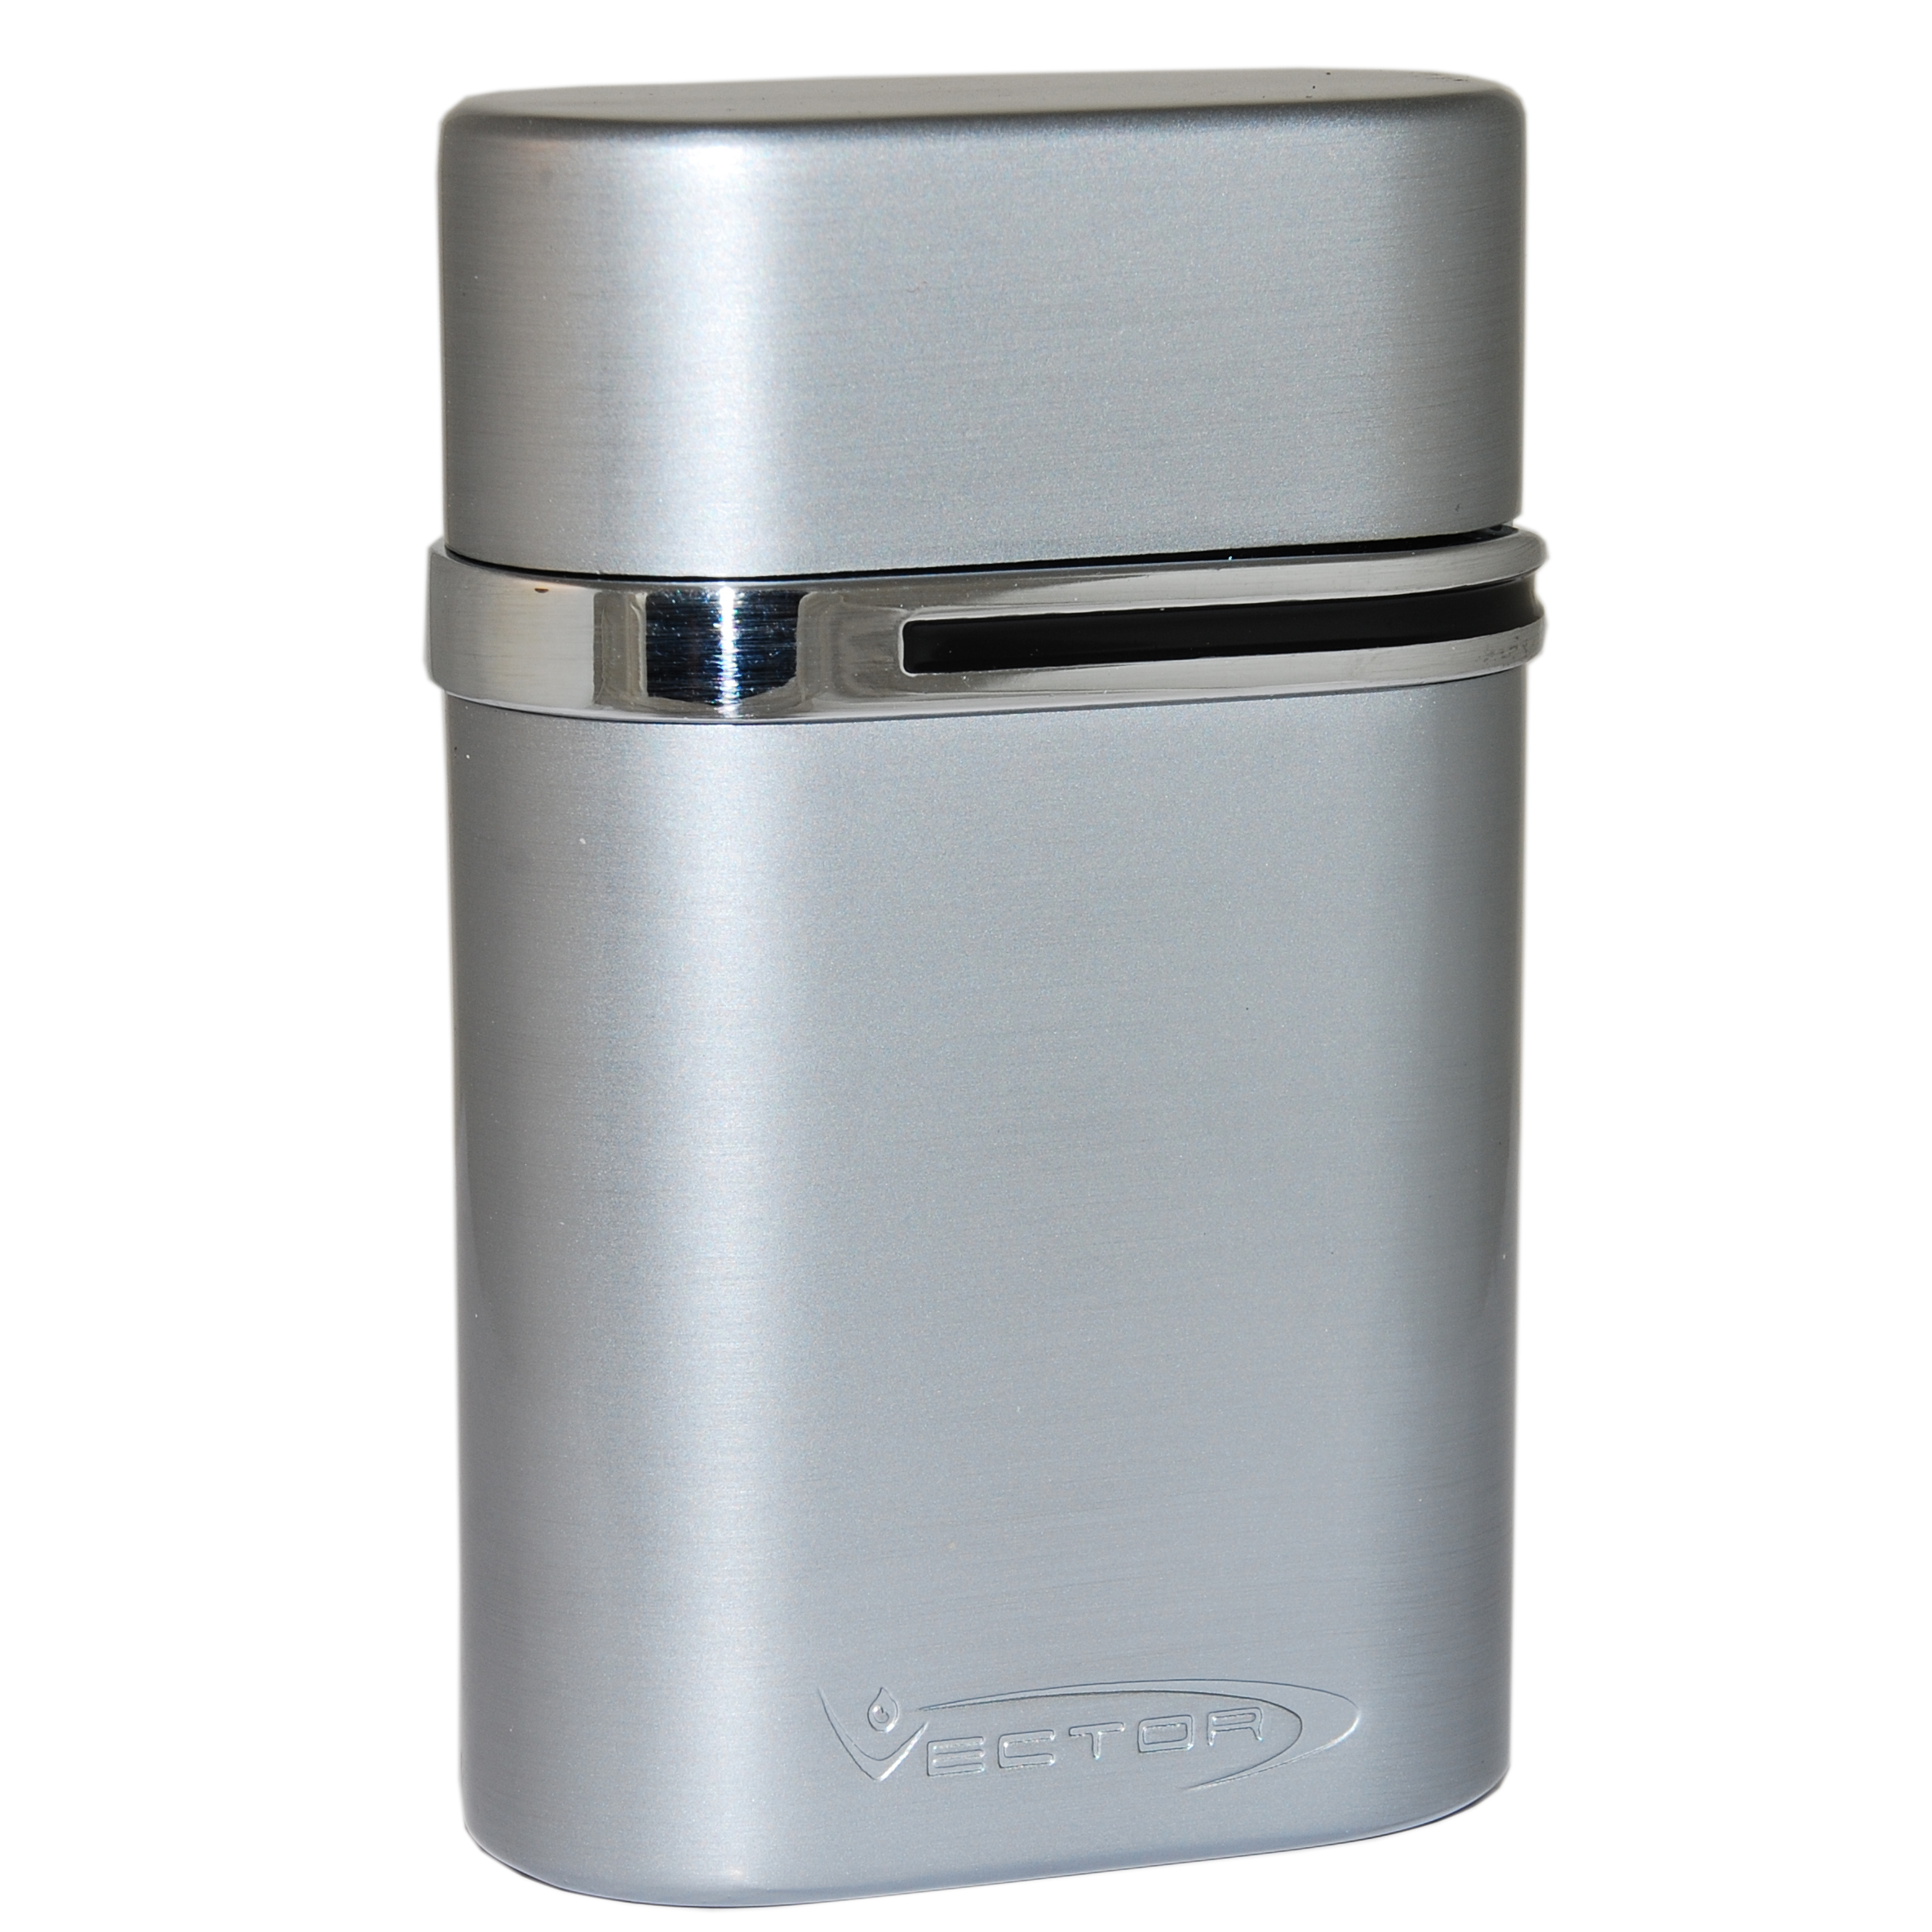 2368x2368 Vector Thundra Desktop Lighter